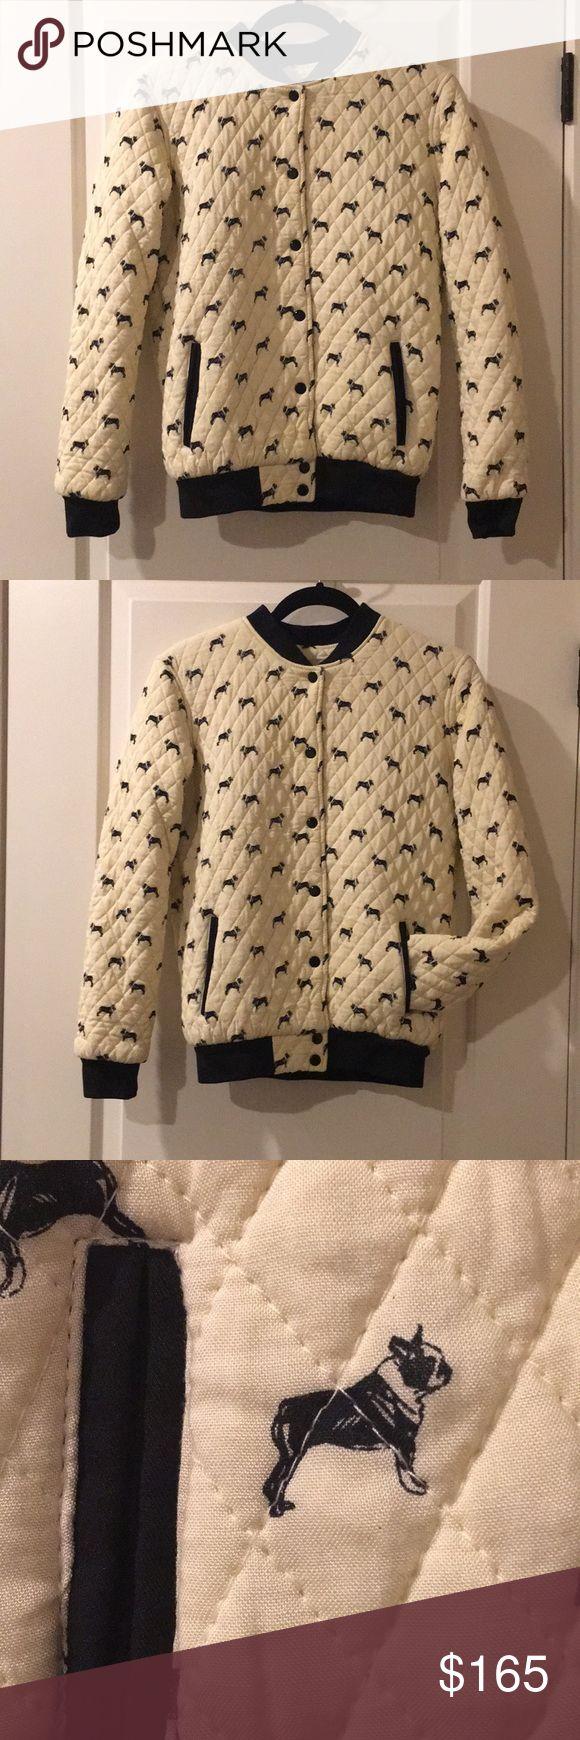 *New* Boston Terrier / French Bulldog Jacket *New Boston Terrier / French Bulldog Jacket Very Rare / HTF  Very Cute Jacket !!  Size :M Jackets & Coats